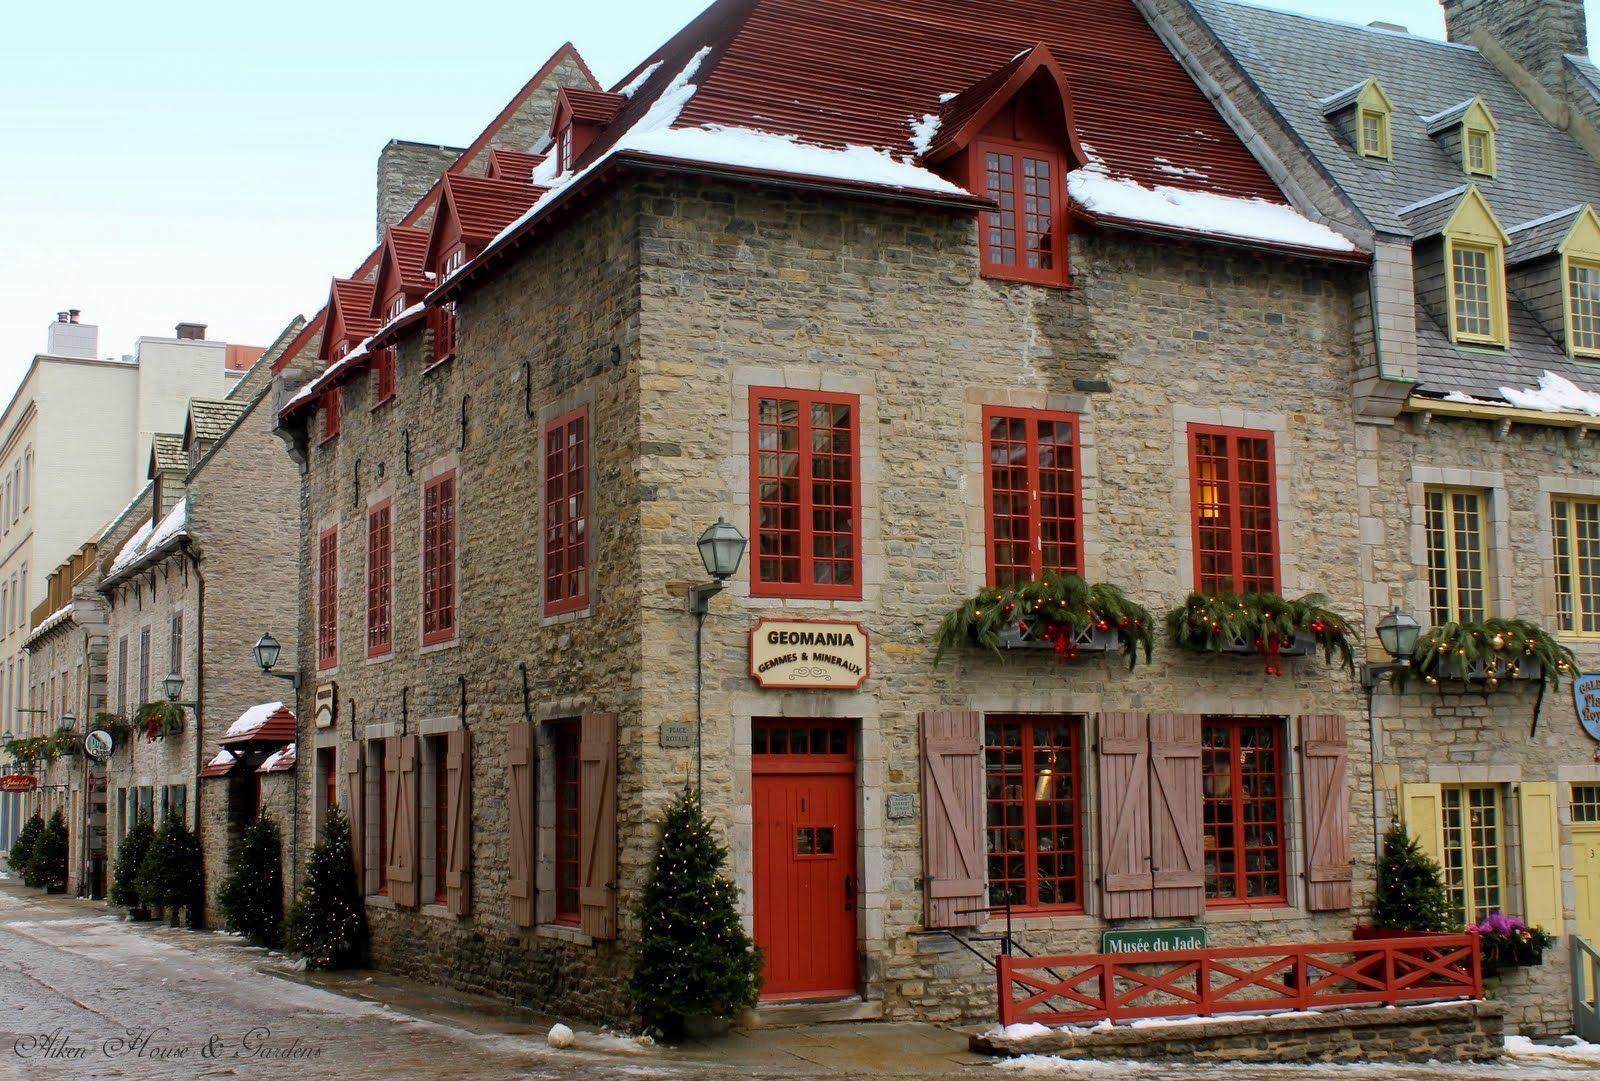 Quebec City Canada   Exteriors - Misc.   Pinterest   Quebec city and ...